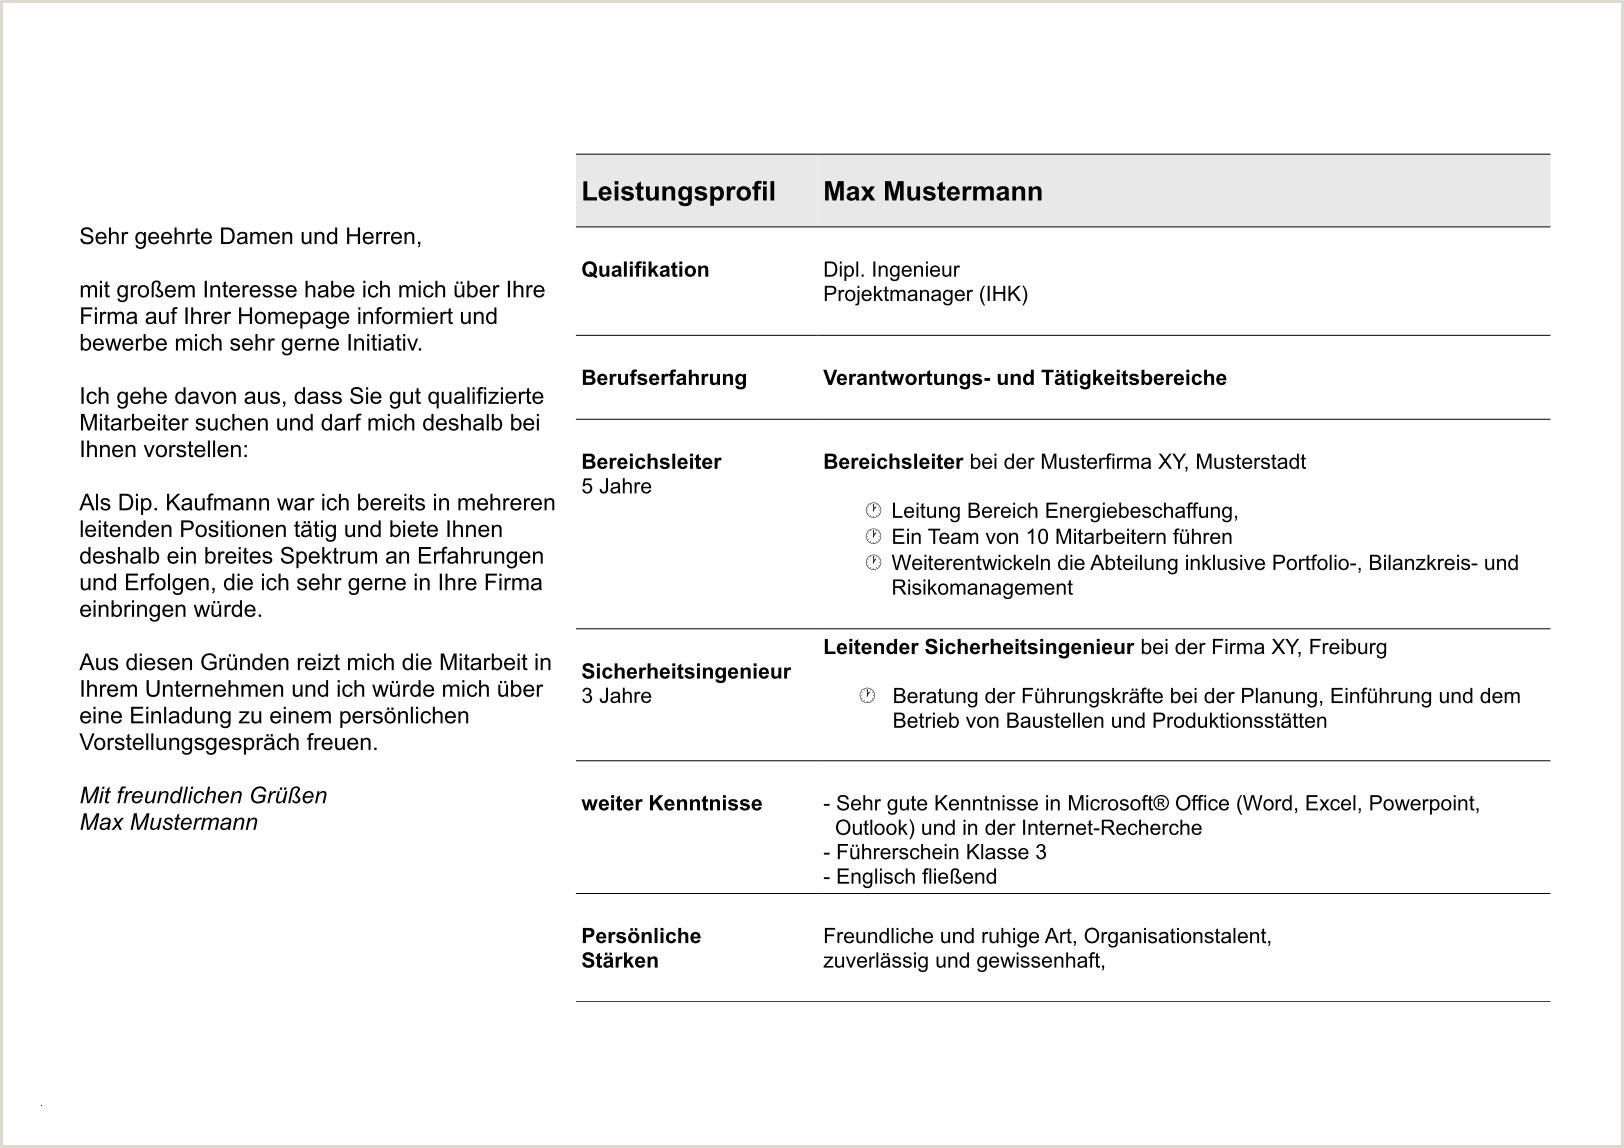 Qualifizierter Lebenslauf Muster 11 Bewerbung Ingenieur Muster